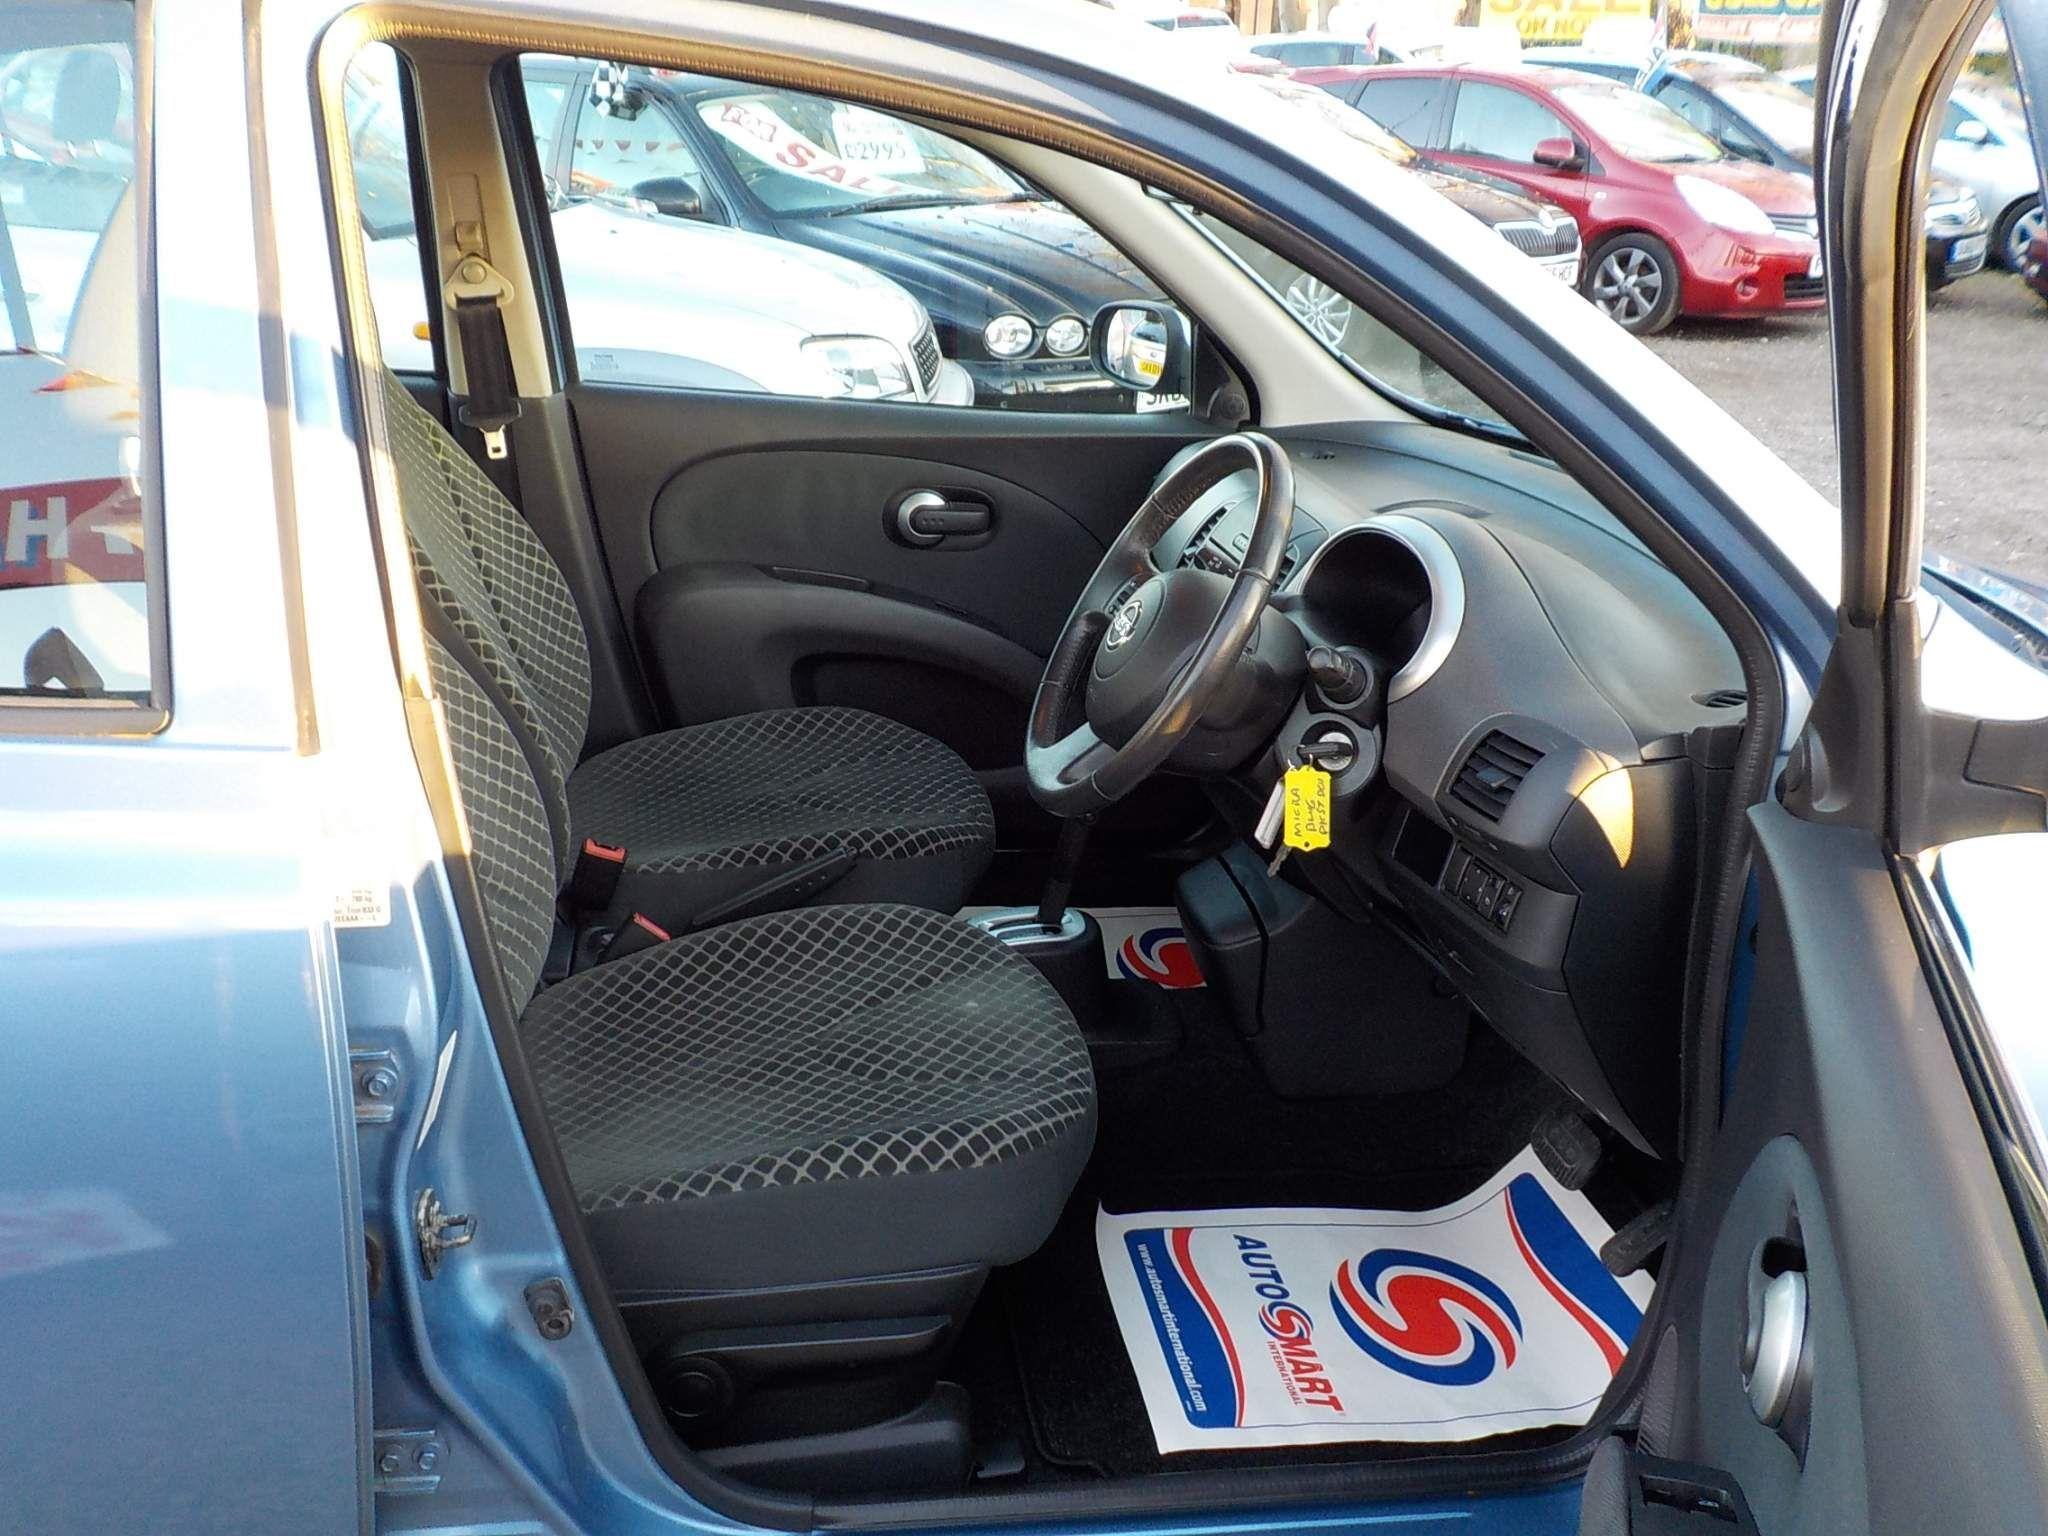 Nissan Micra 1.2 16v Spirita 5dr